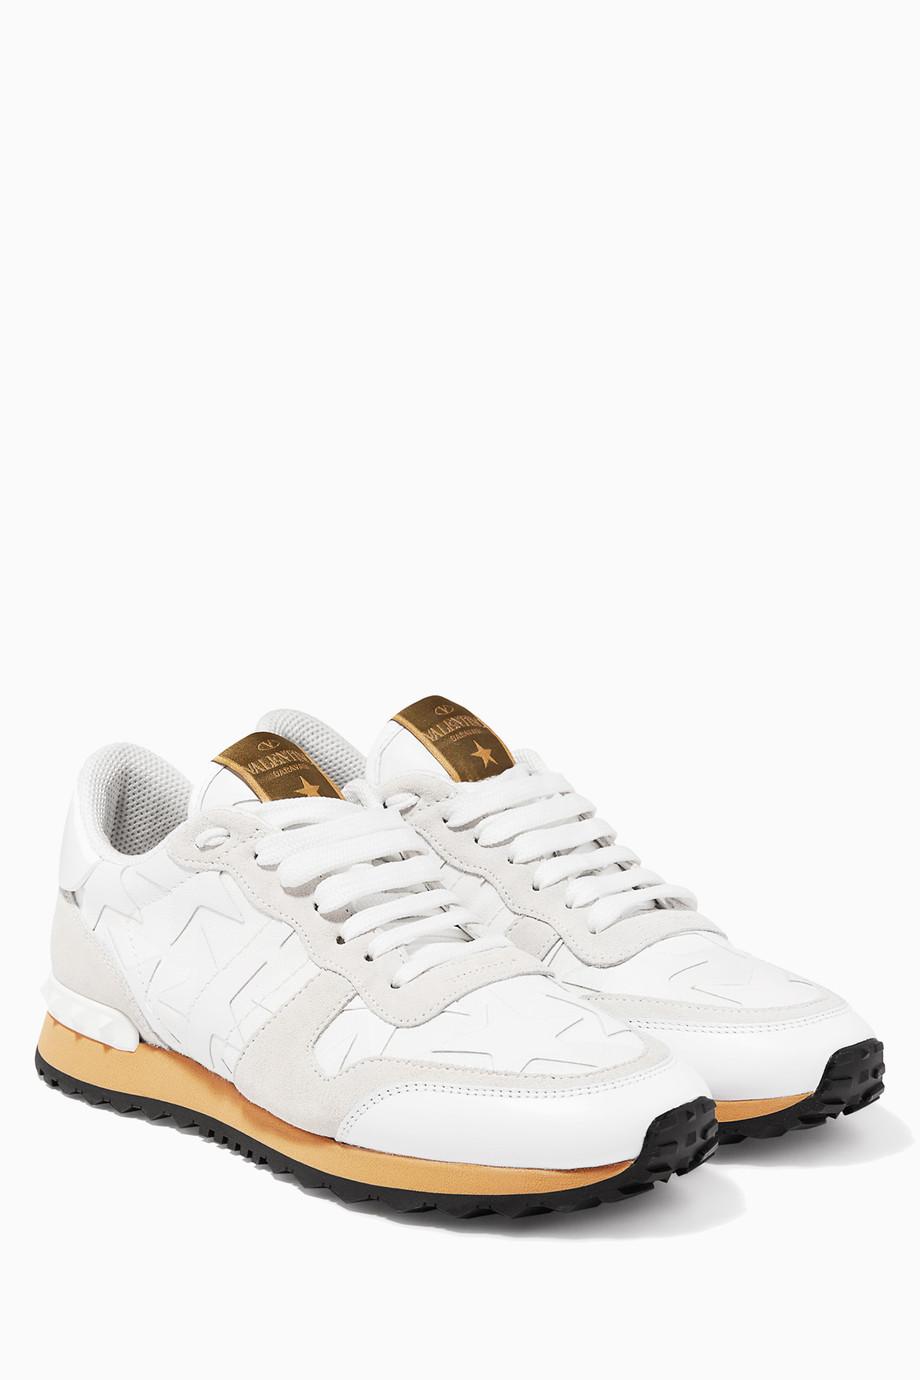 250e52b9ebcbf Shop Valentino White Bianco Camo RockRunner Sneakers for Women